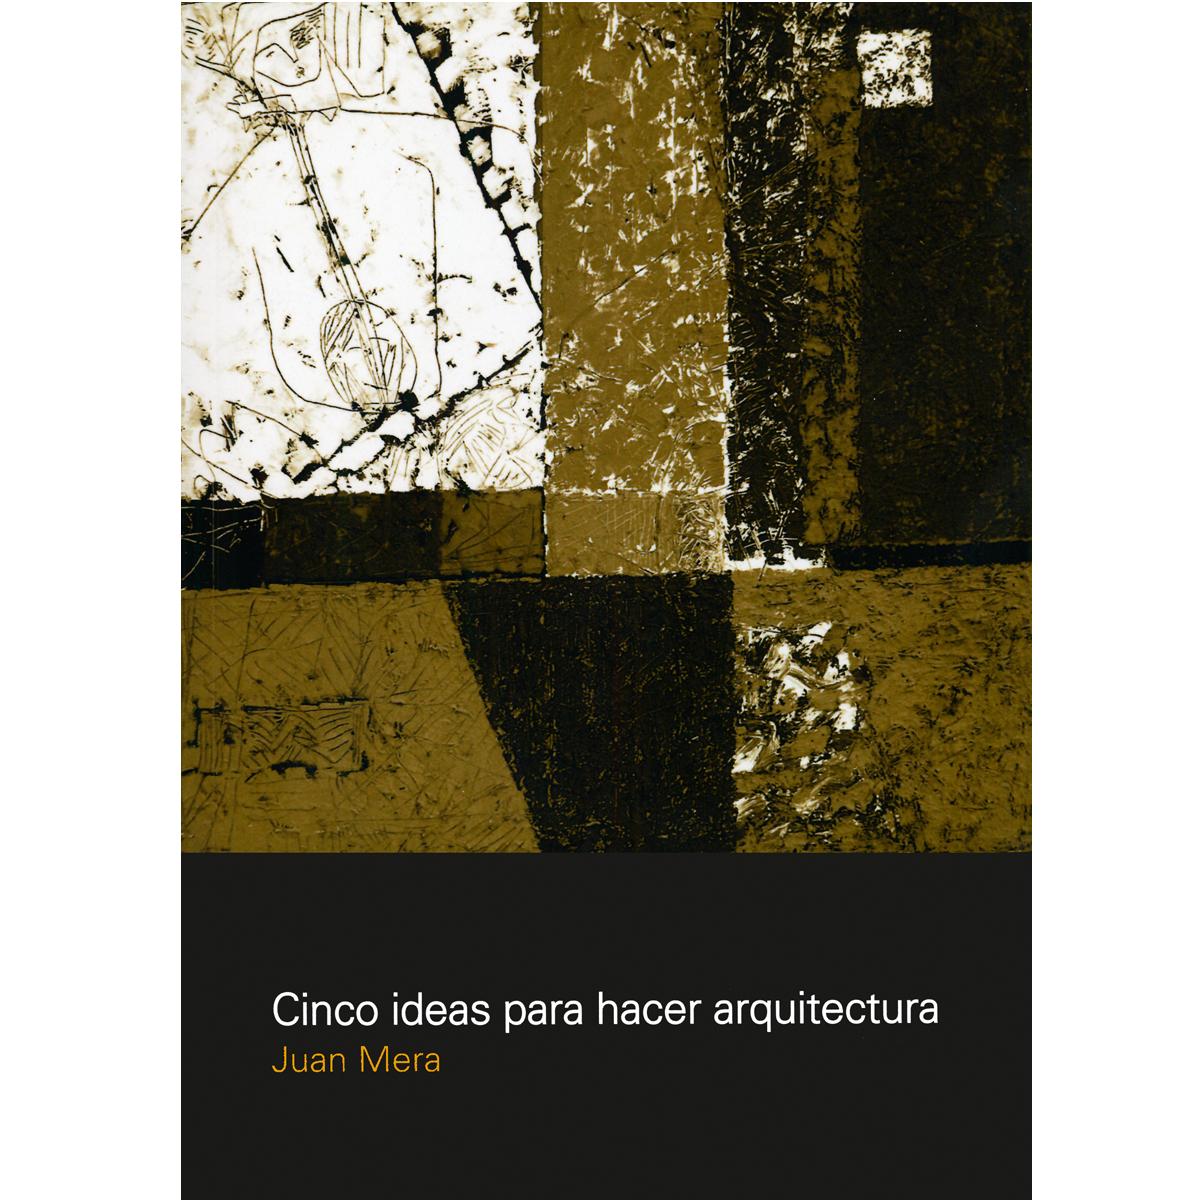 Cinco ideas para hacer arquitectura